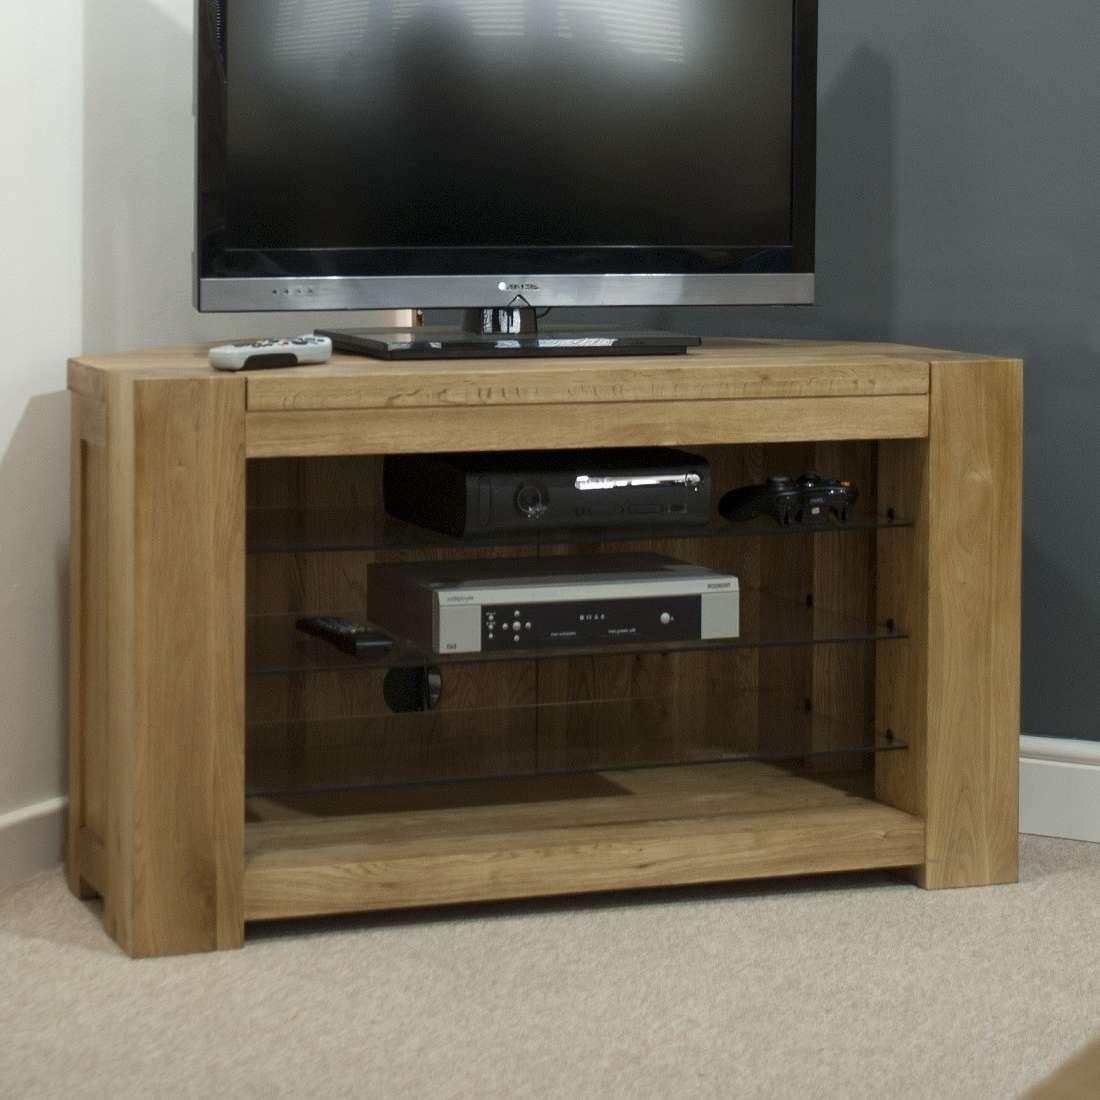 Trend Solid Oak Corner Tv Unit | Oak Furniture Uk With Light Oak Corner Tv Cabinets (View 10 of 20)